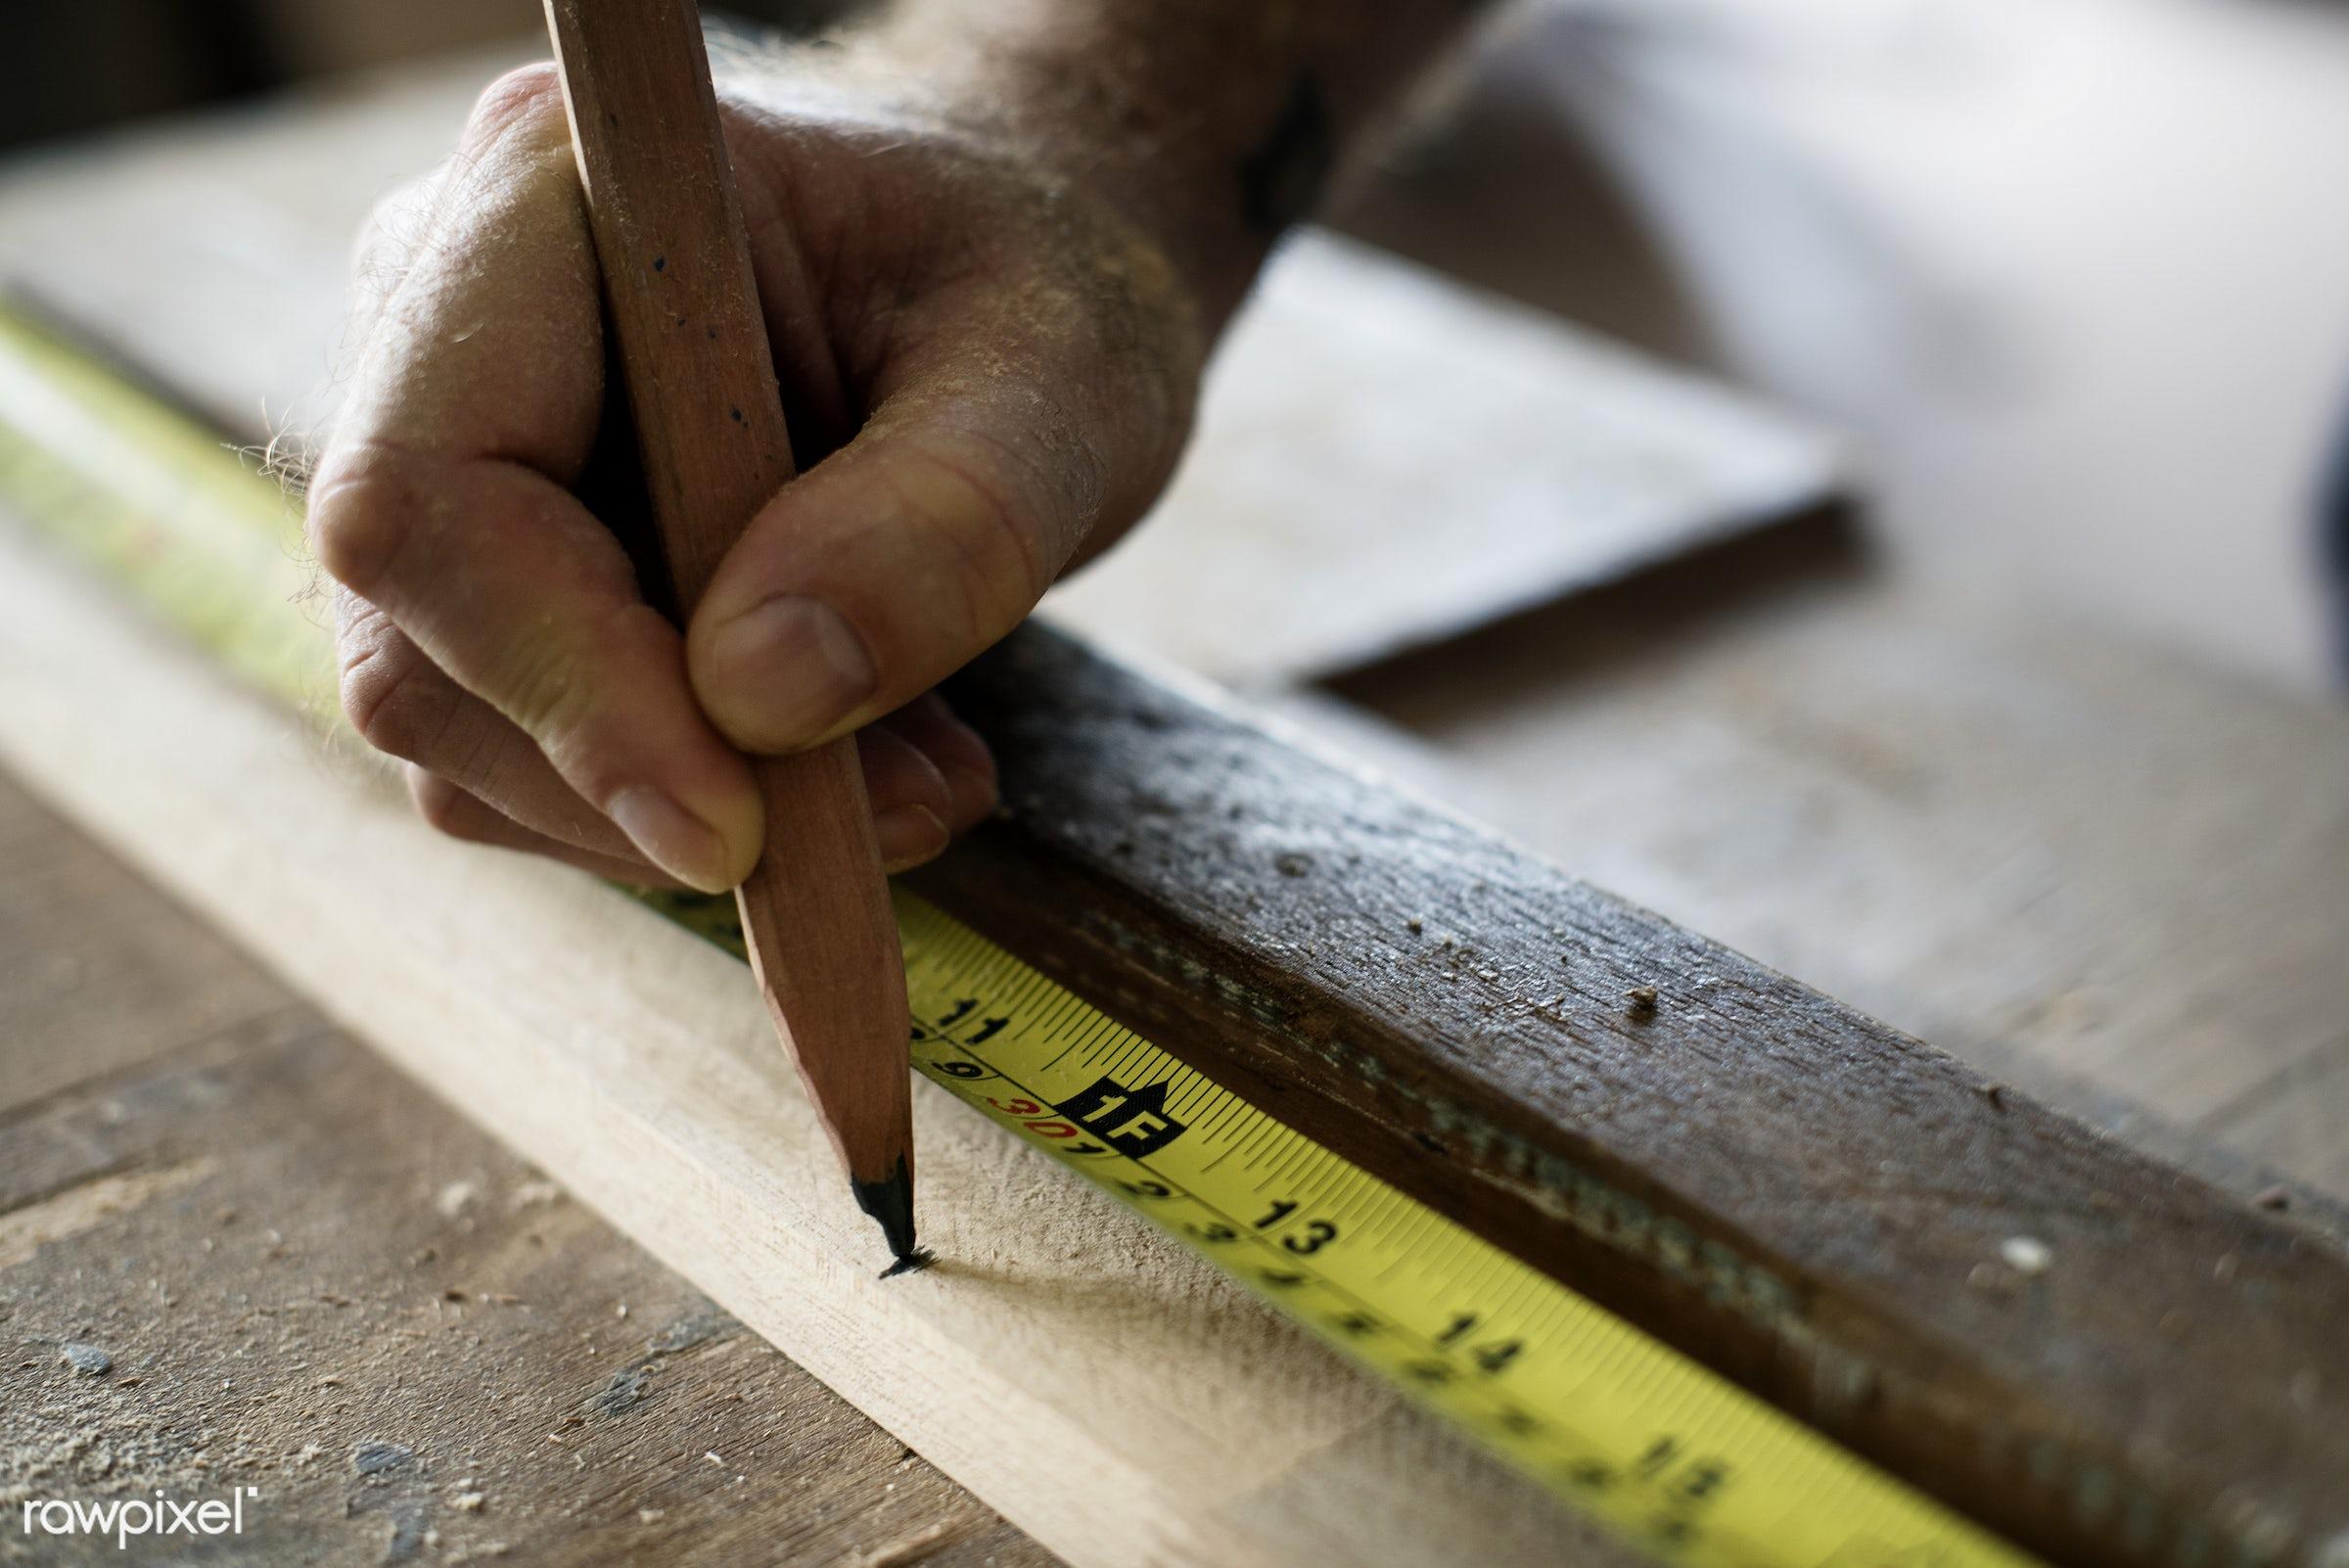 craft, wood, carpentry, tool, plank, equipment, diy, carpenter, handyman, craftsman, worker, repair, industry, measurement...